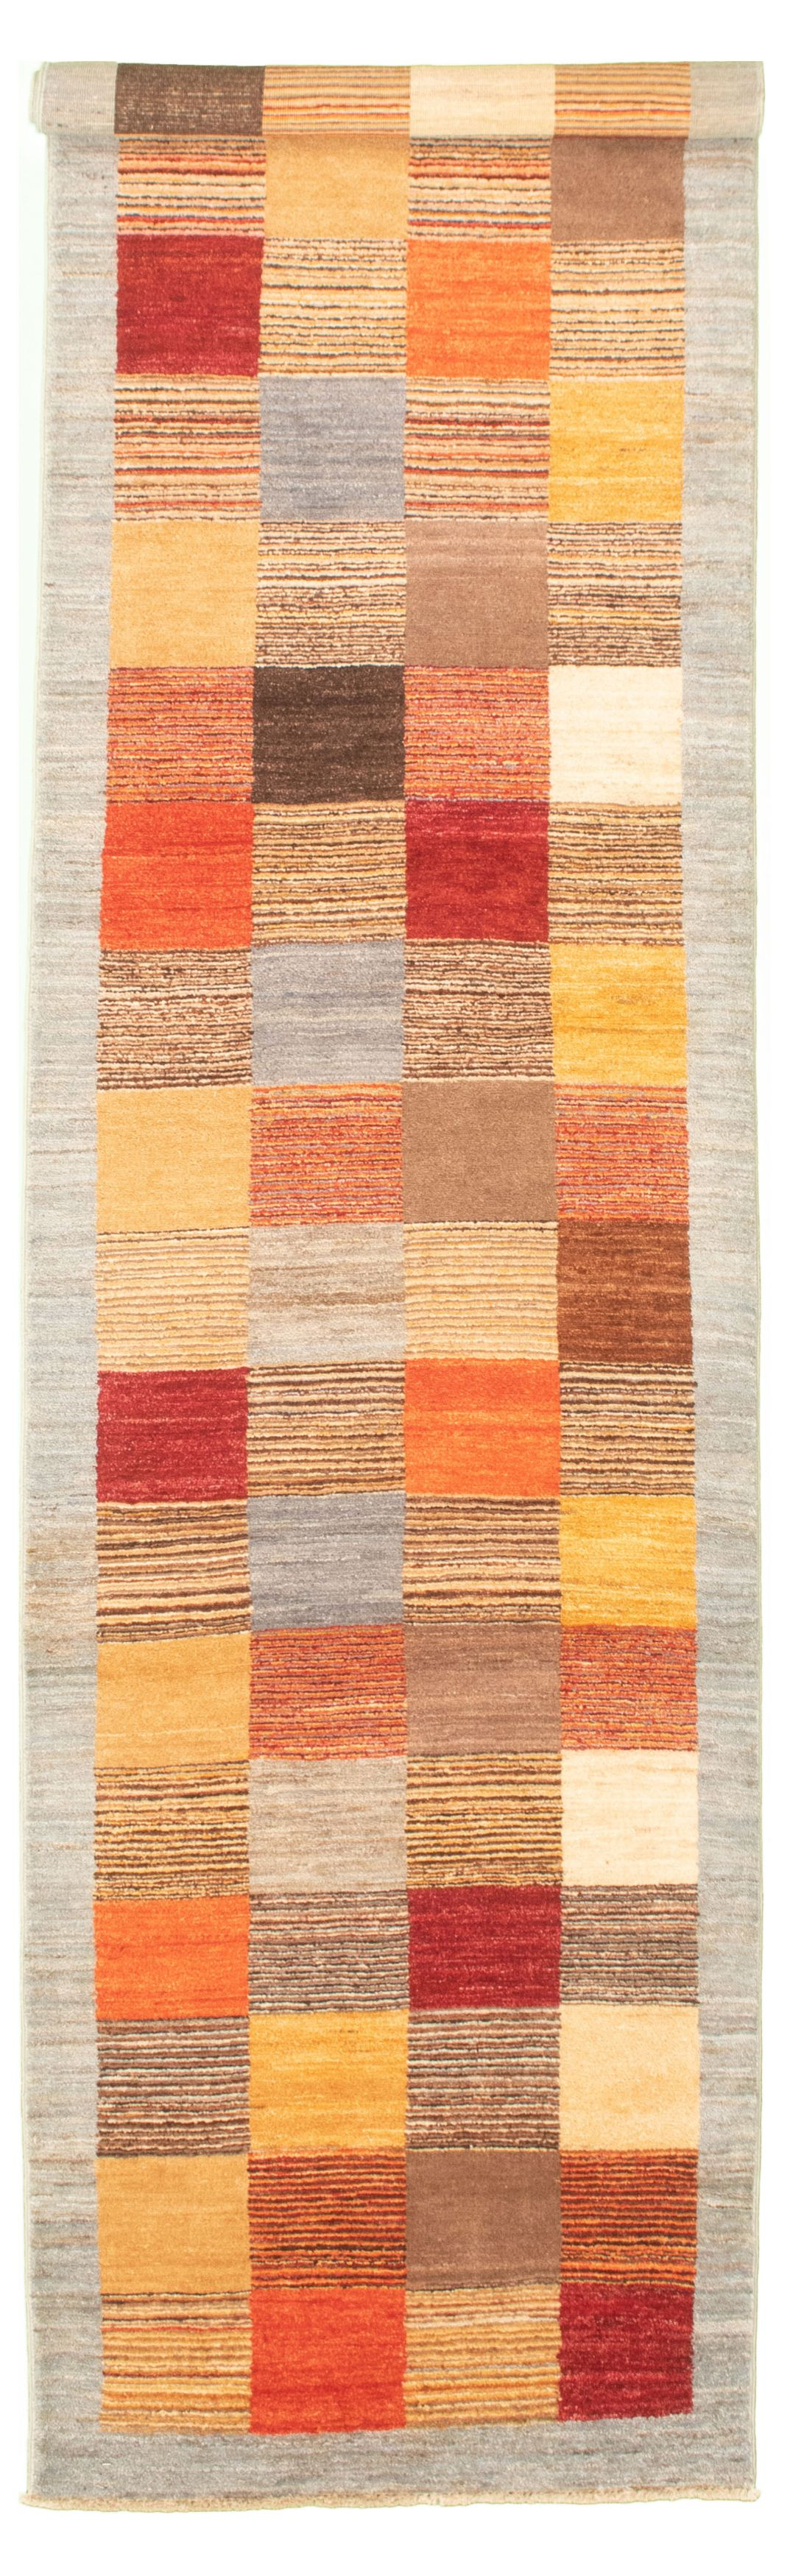 "Hand-knotted Peshawar Ziegler Light Blue  Wool Rug 2'7"" x 10'5"" Size: 2'7"" x 10'5"""